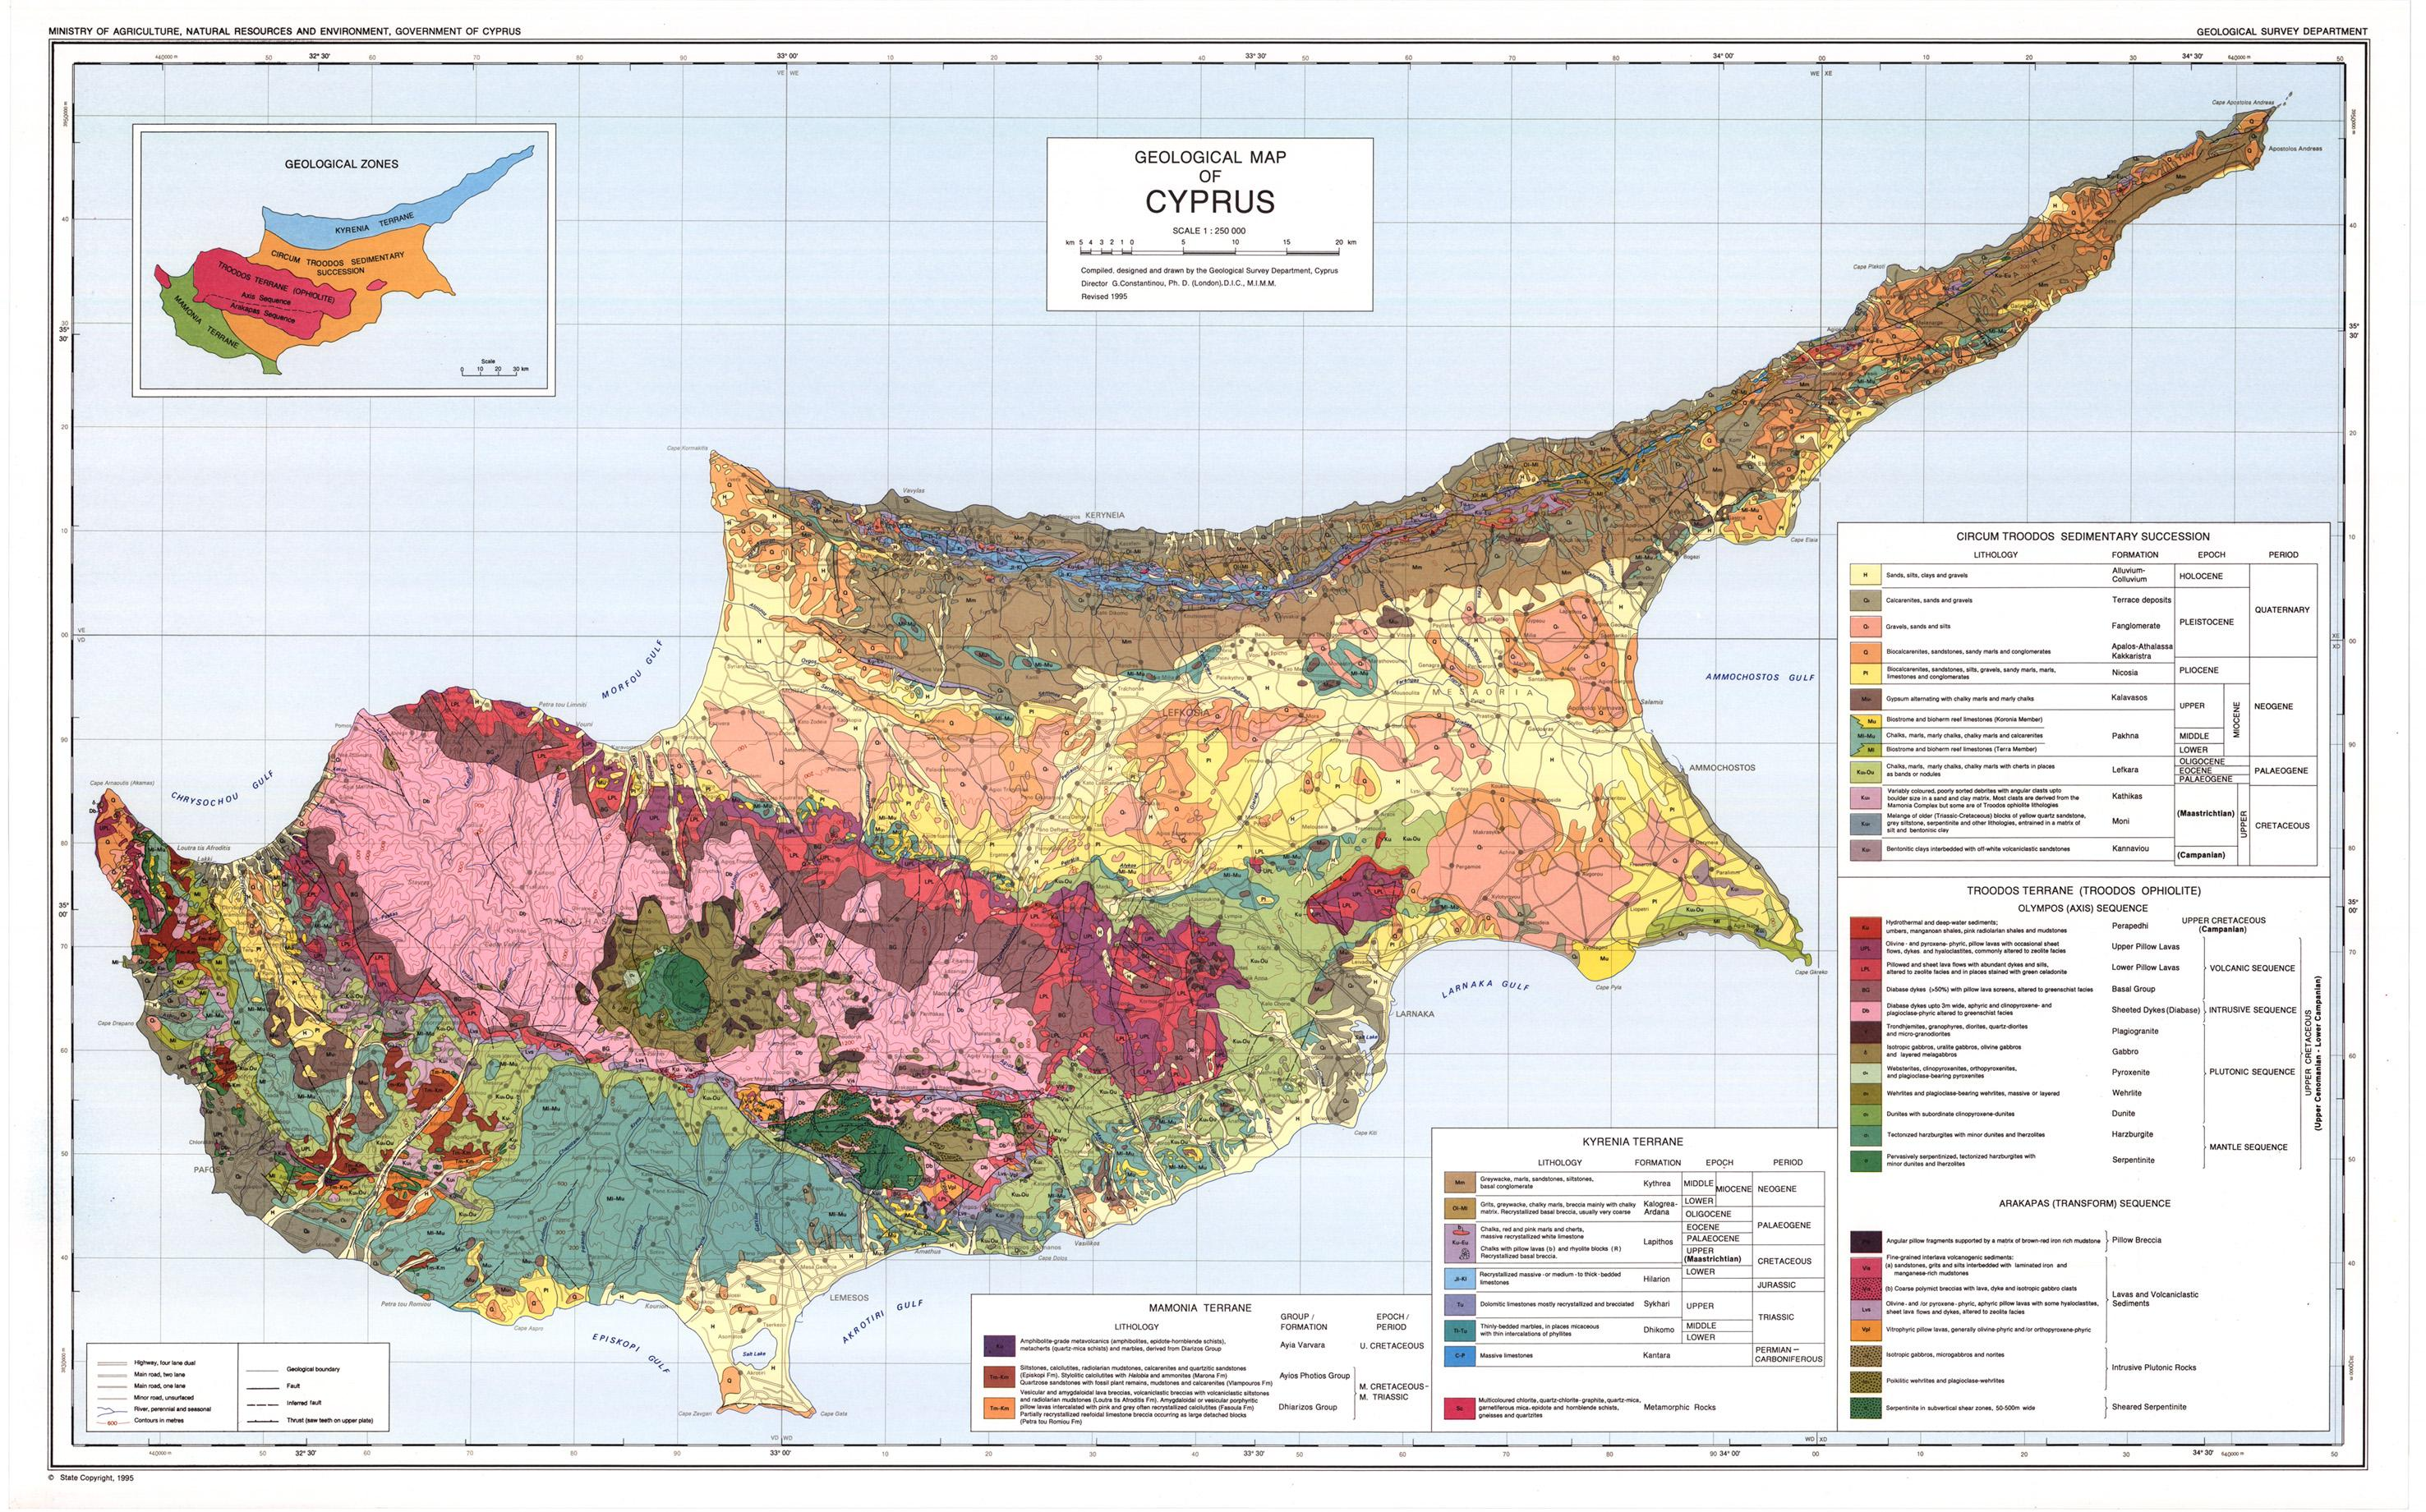 Cartina Geografica Europa Meridionale.Mappa Geologica Di Cipro Cipro Mappa Geografica Europa Del Sud Europa